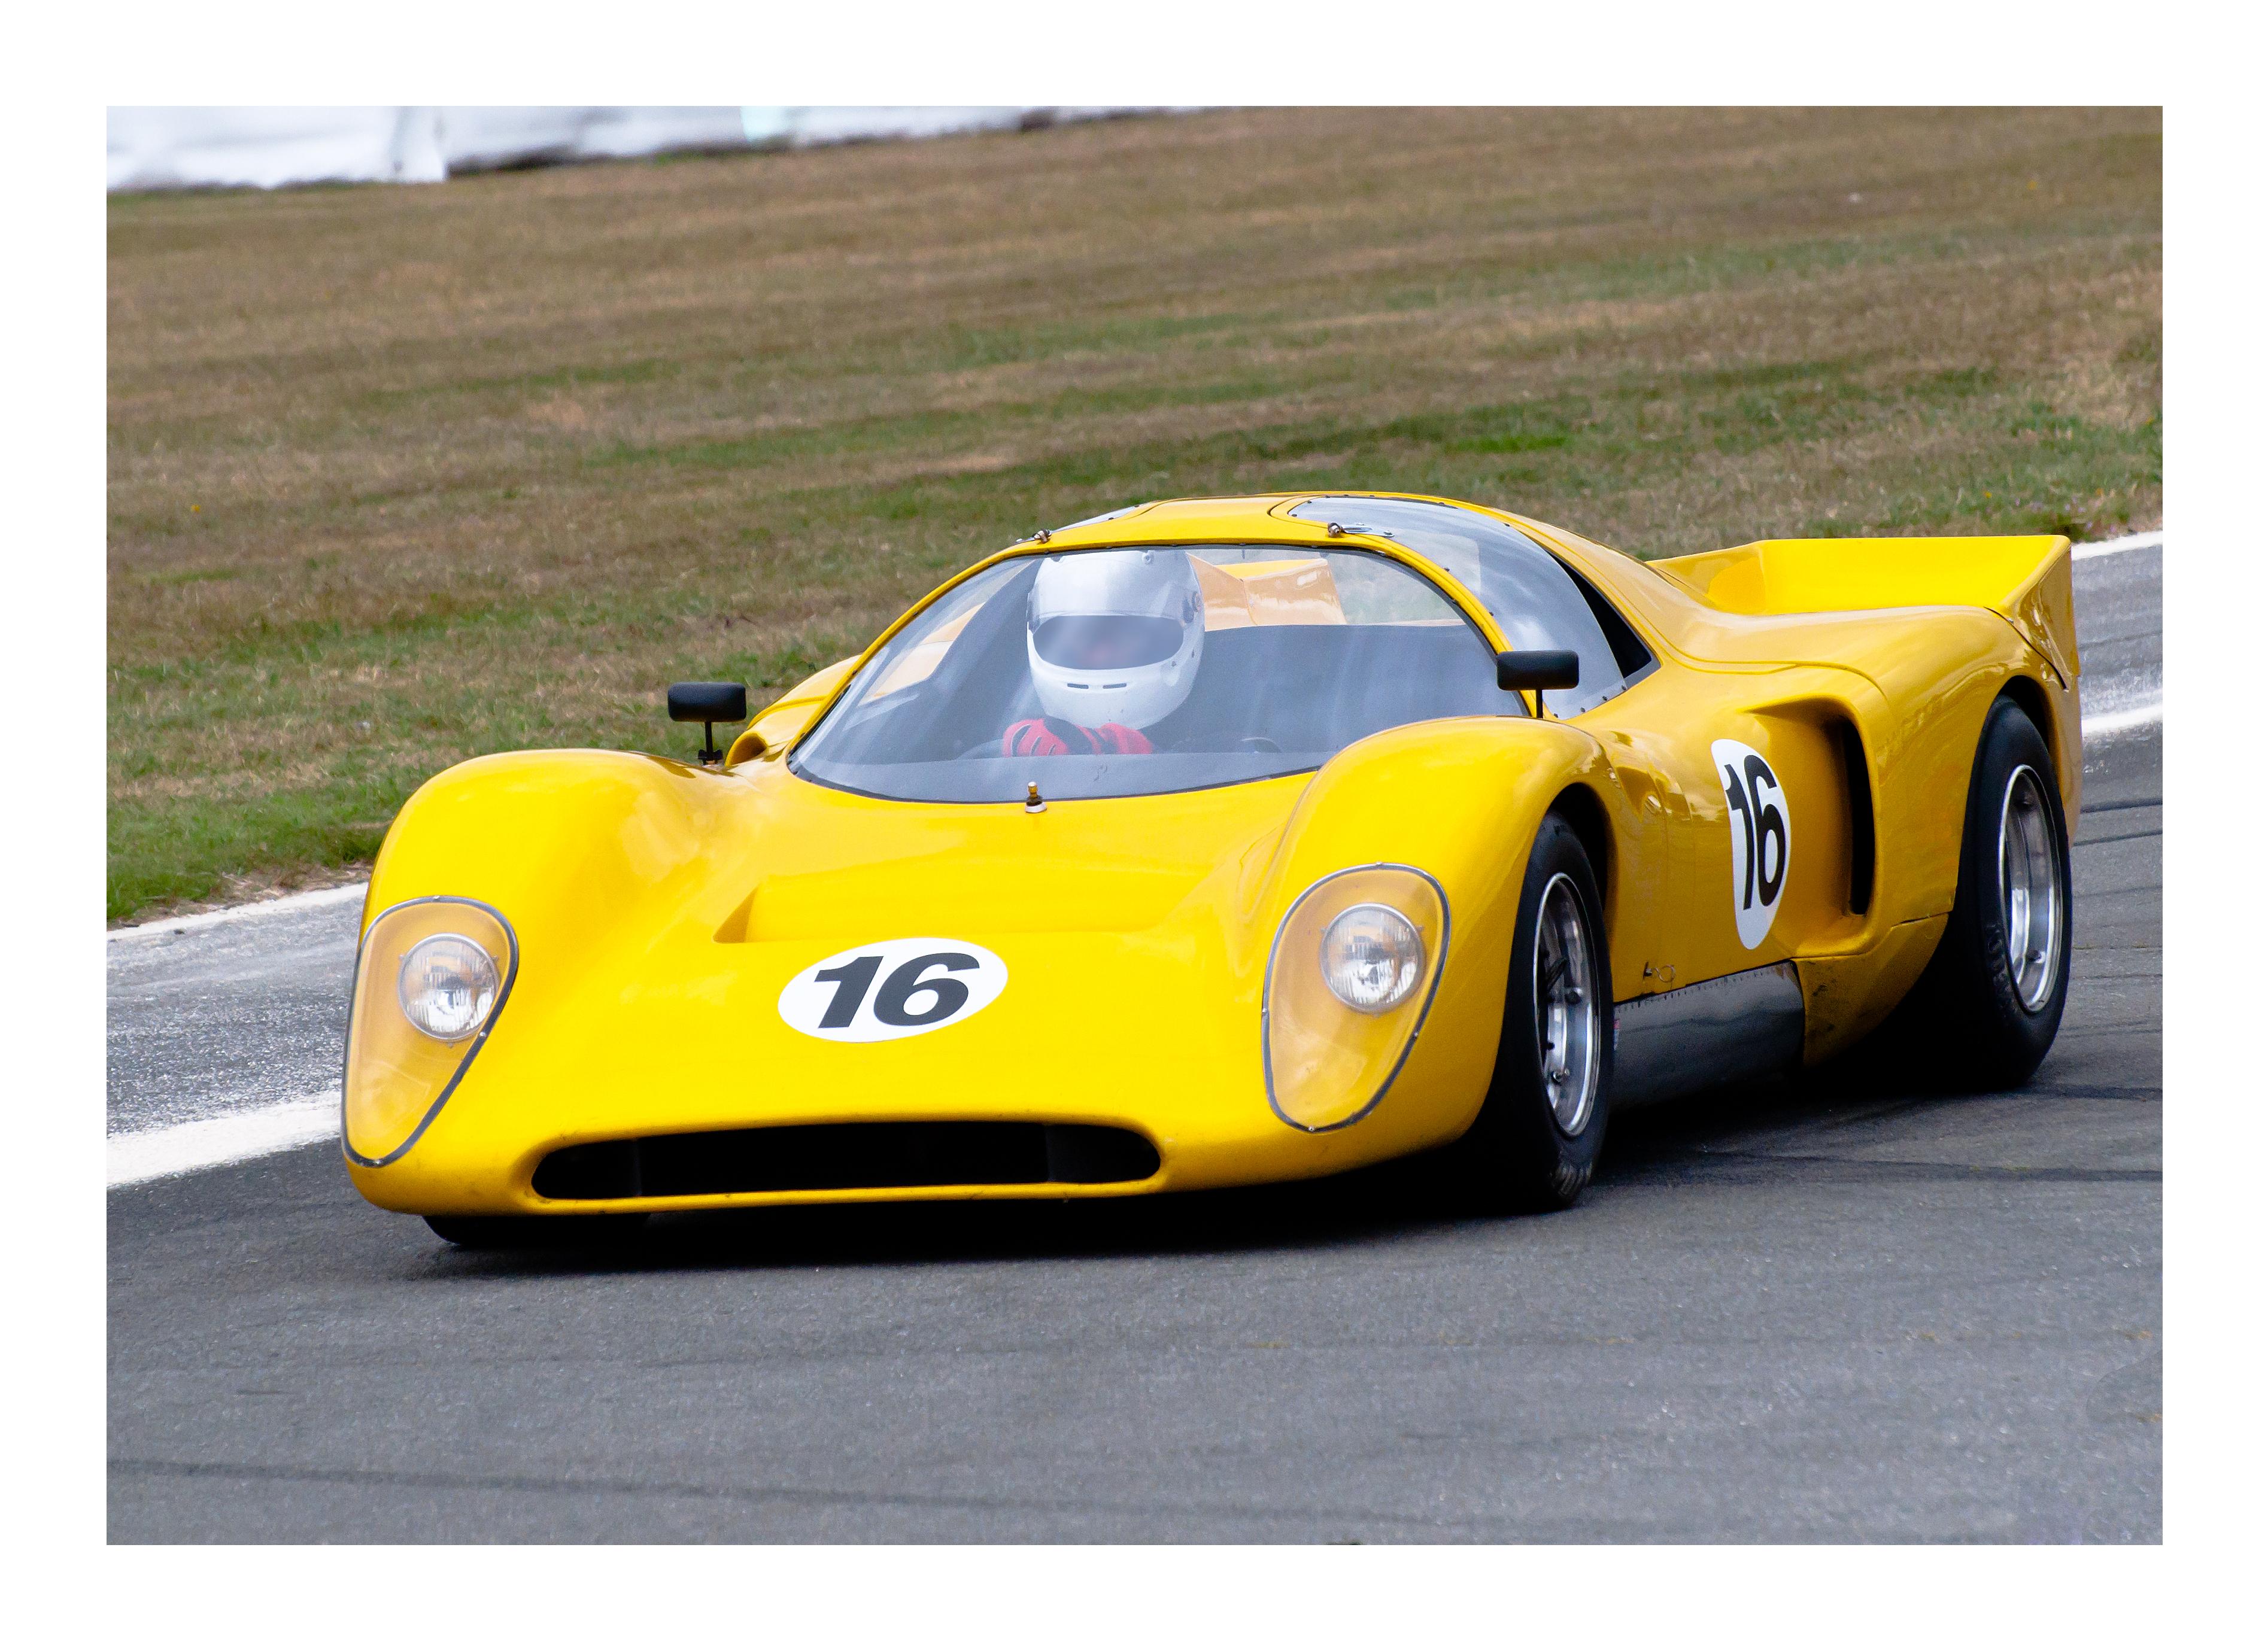 Chevron B16 from 1970, Auto racing, Car, Chevron, Chrome, HQ Photo